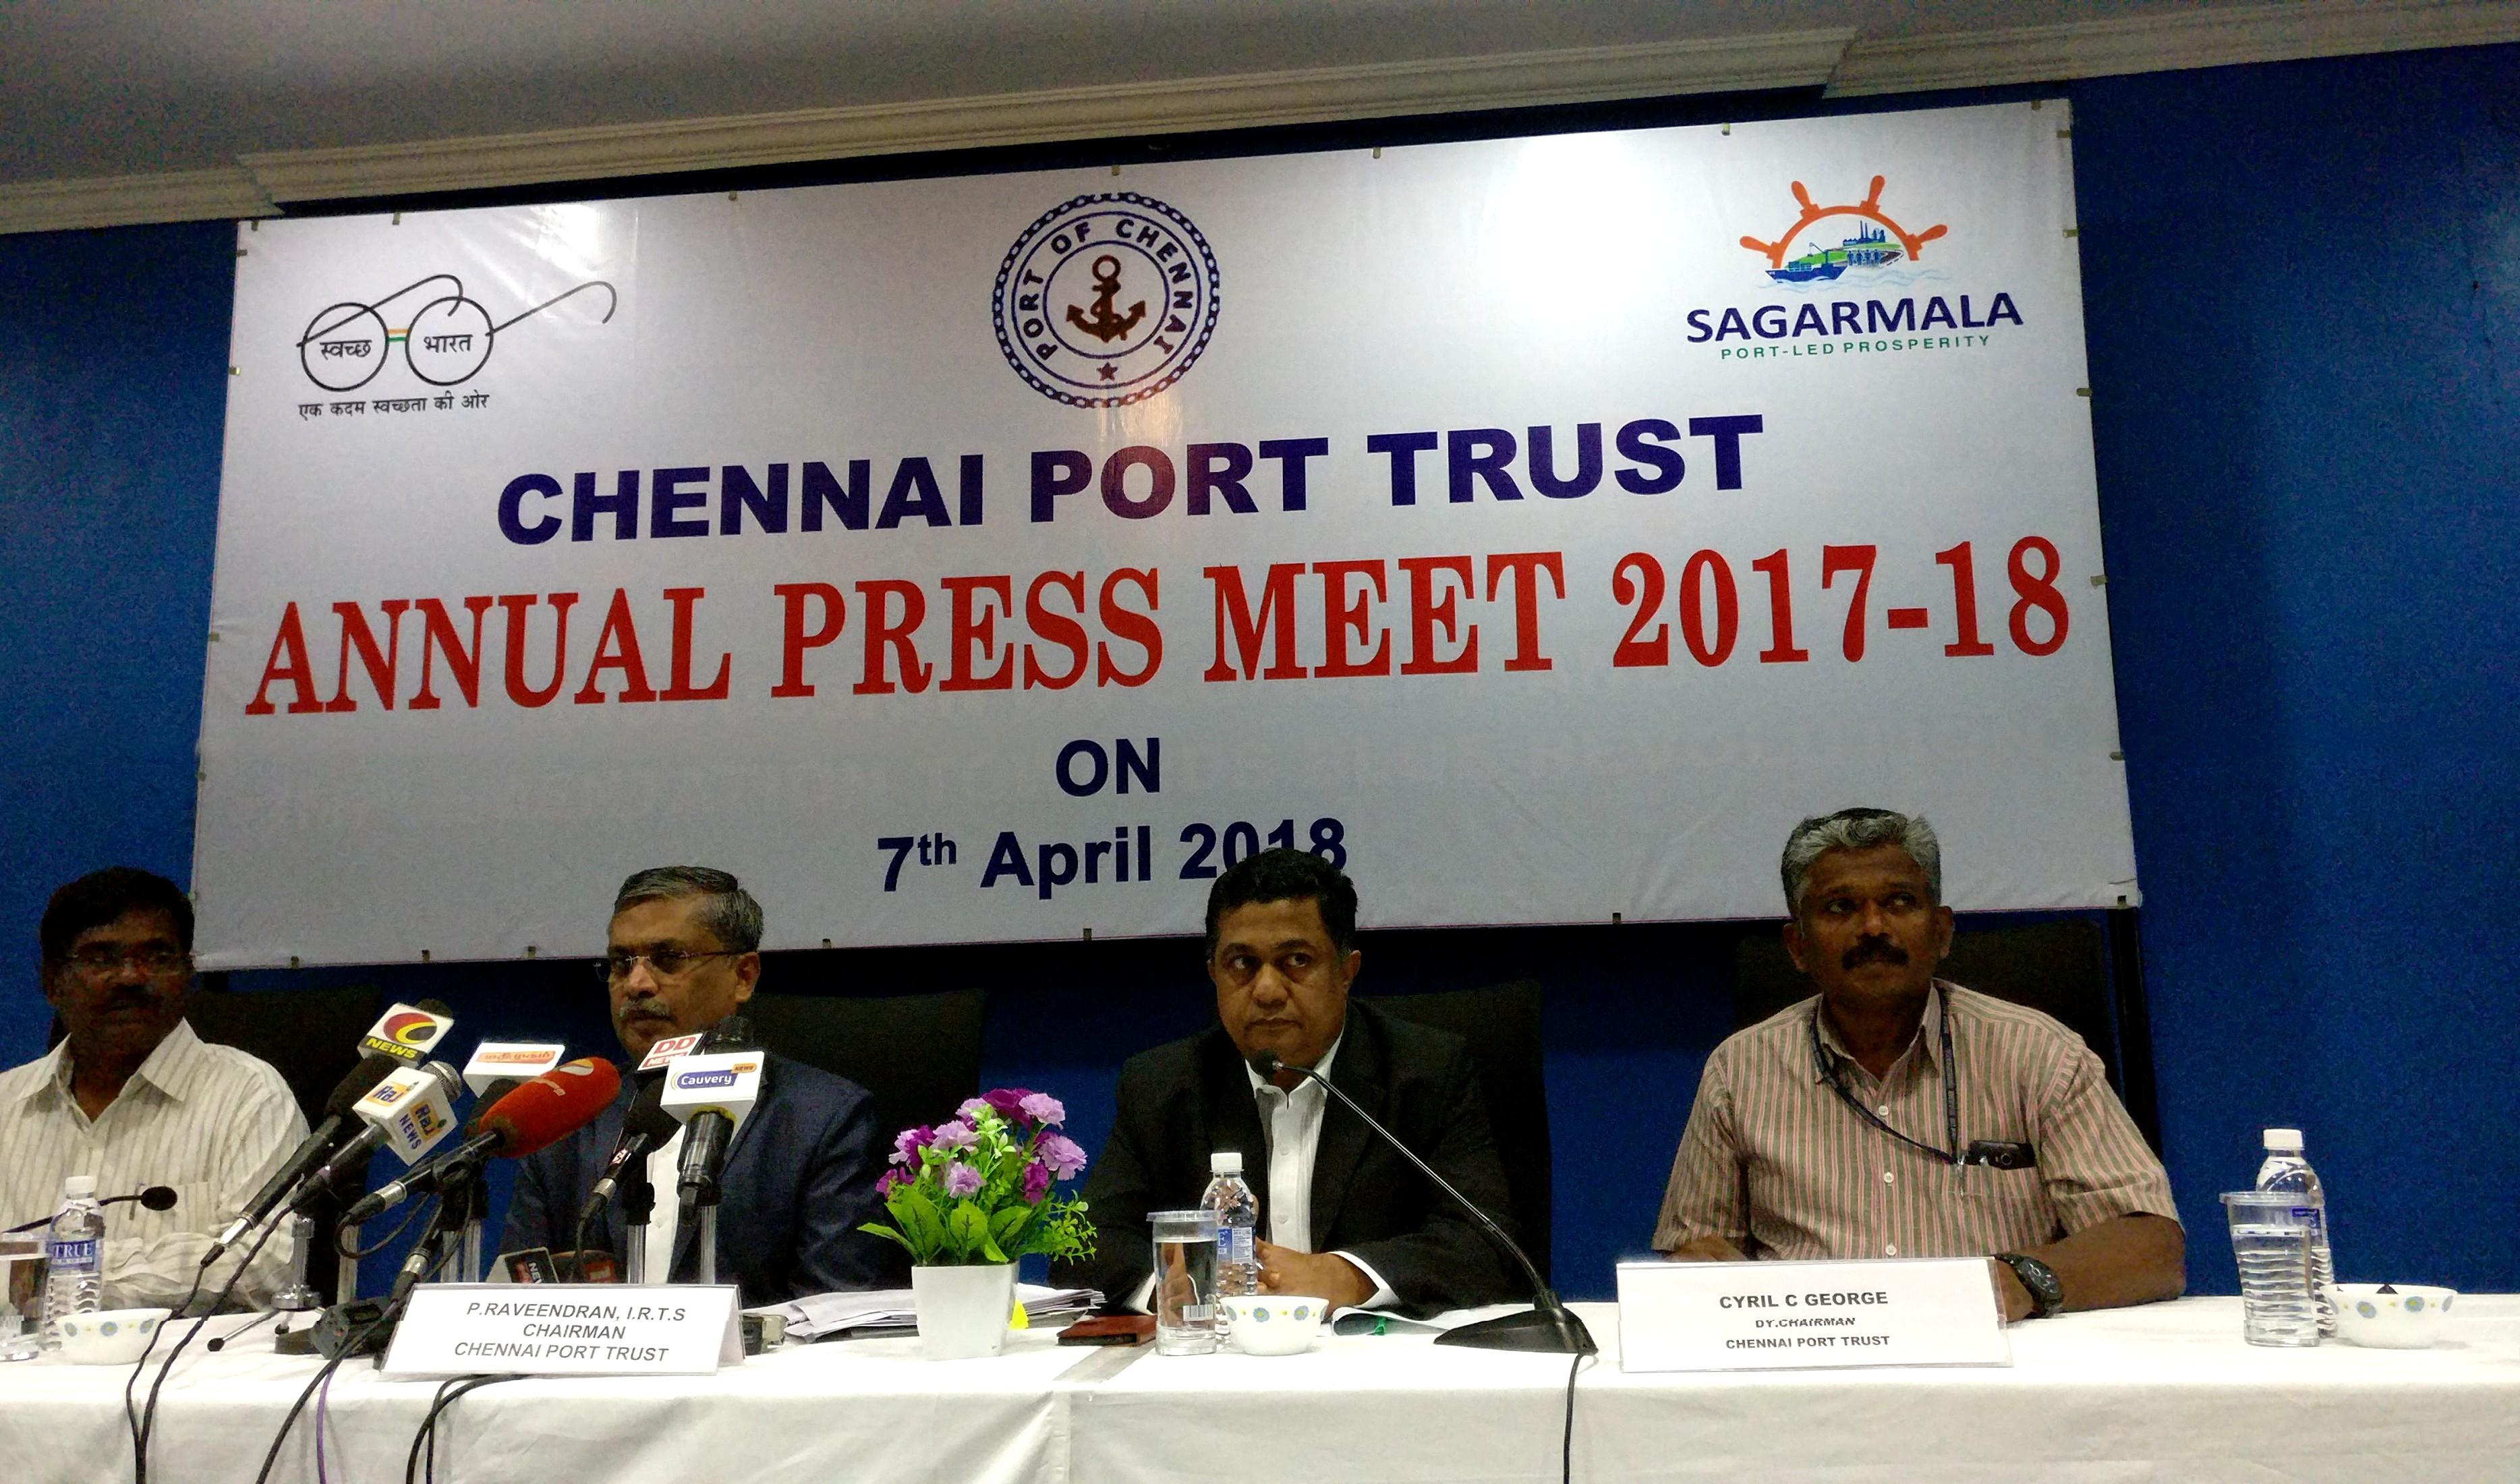 Chennai Port Trust Annual Meet 2017-18 | Ecargolog - Asia's